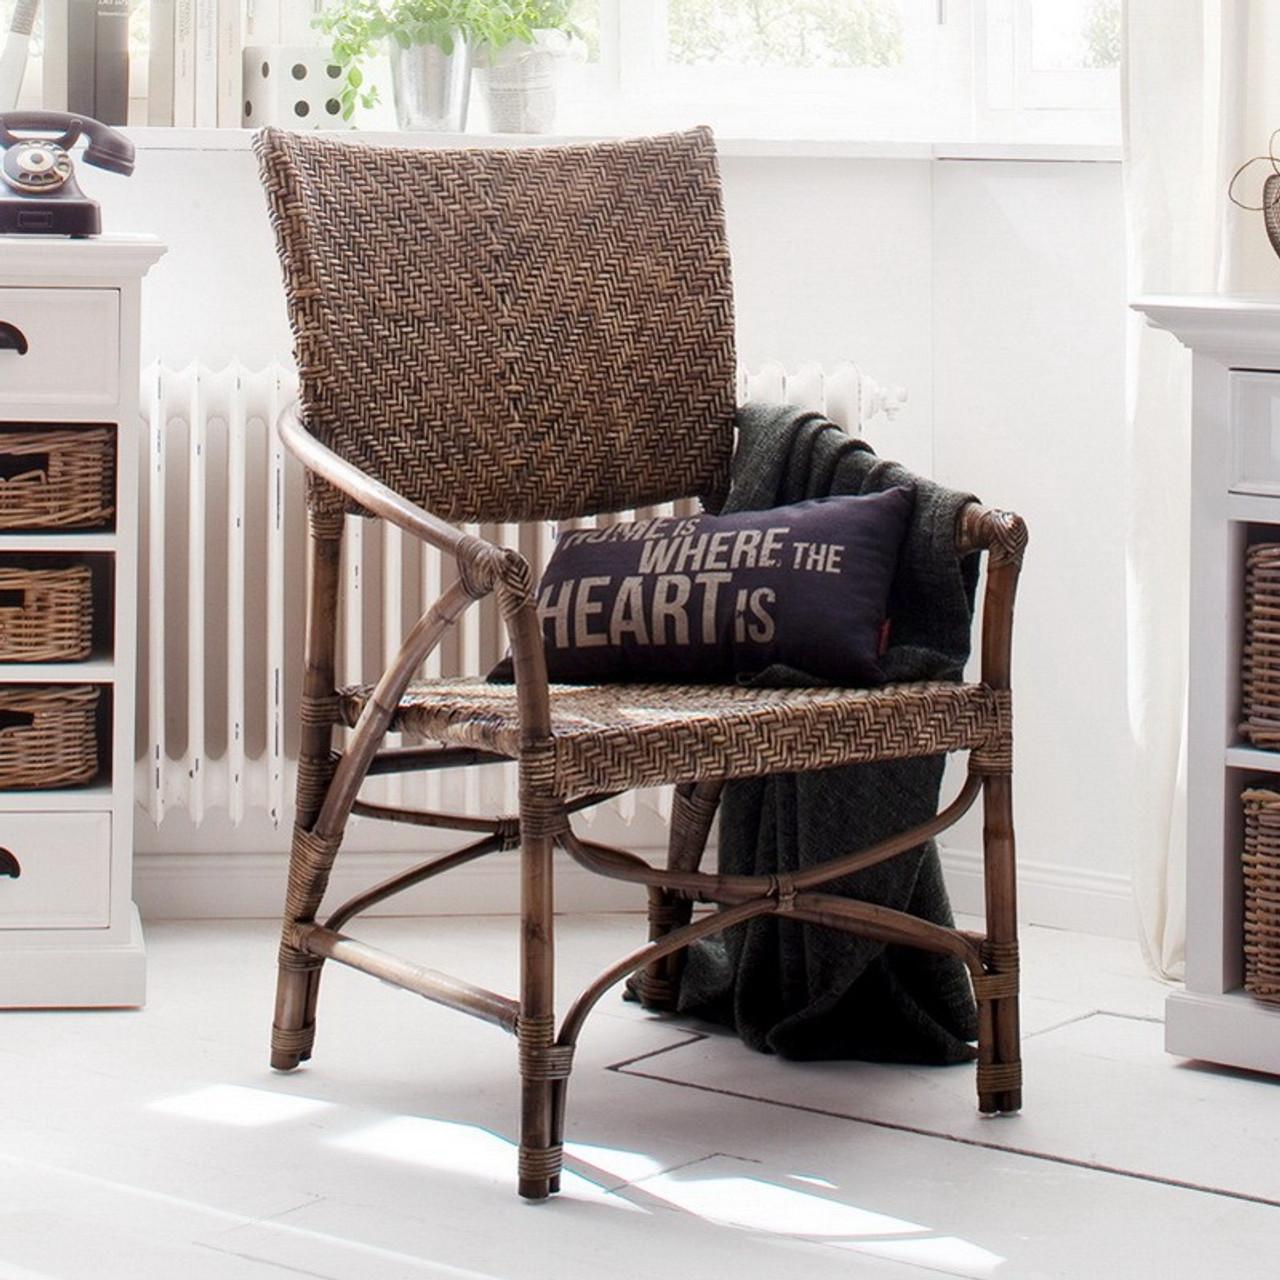 Peachy Arrow Coastal Wicker Woven Accent Chair Theyellowbook Wood Chair Design Ideas Theyellowbookinfo